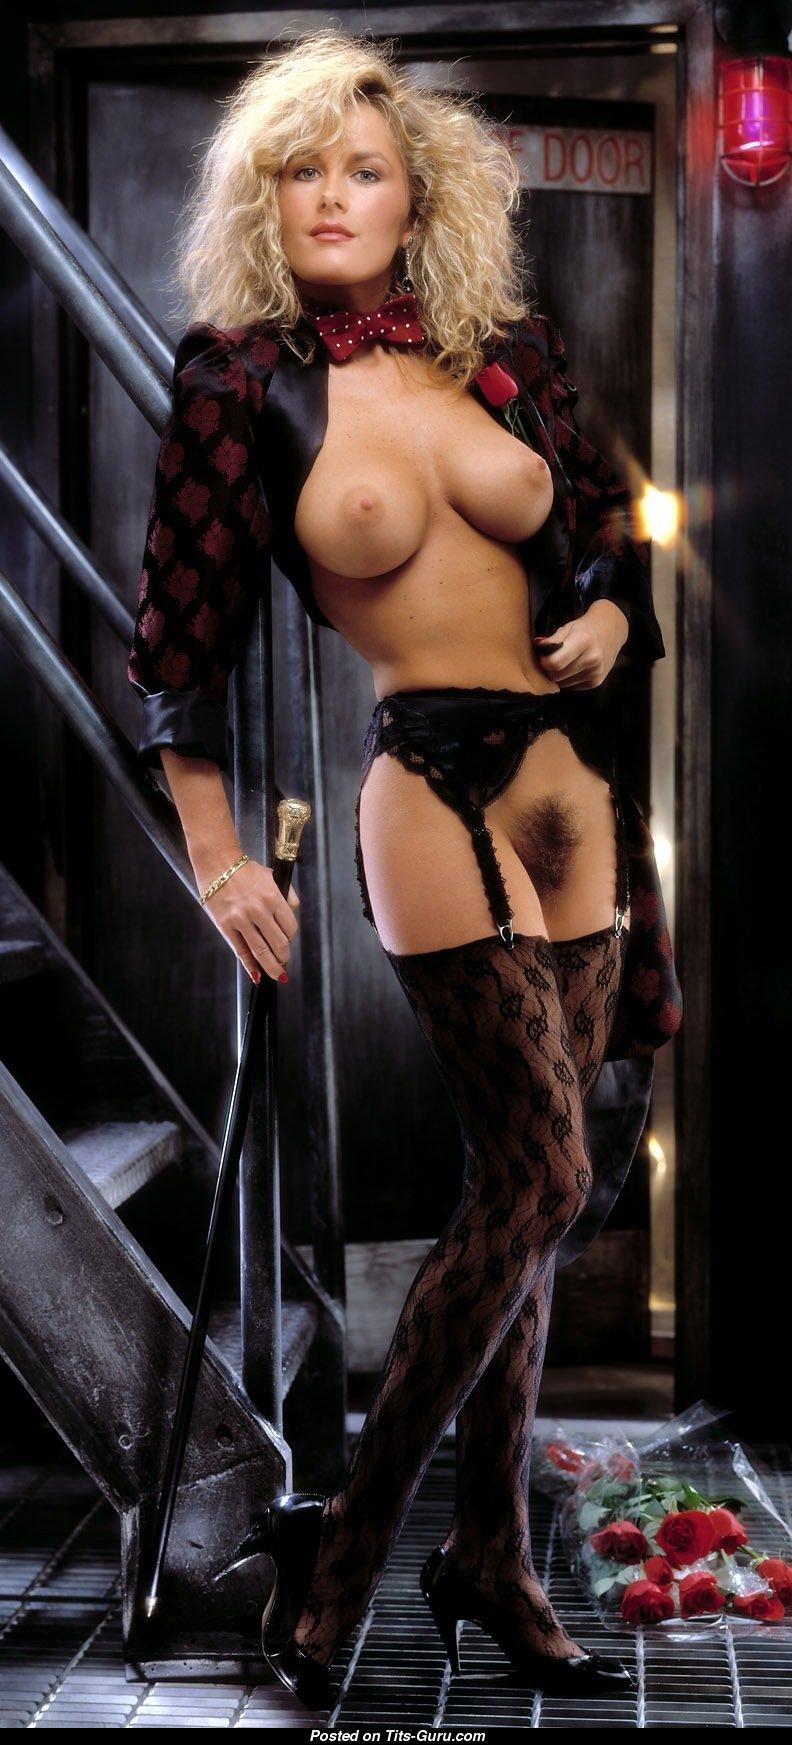 XXX Christine Richters nudes (64 foto and video), Tits, Hot, Selfie, bra 2018